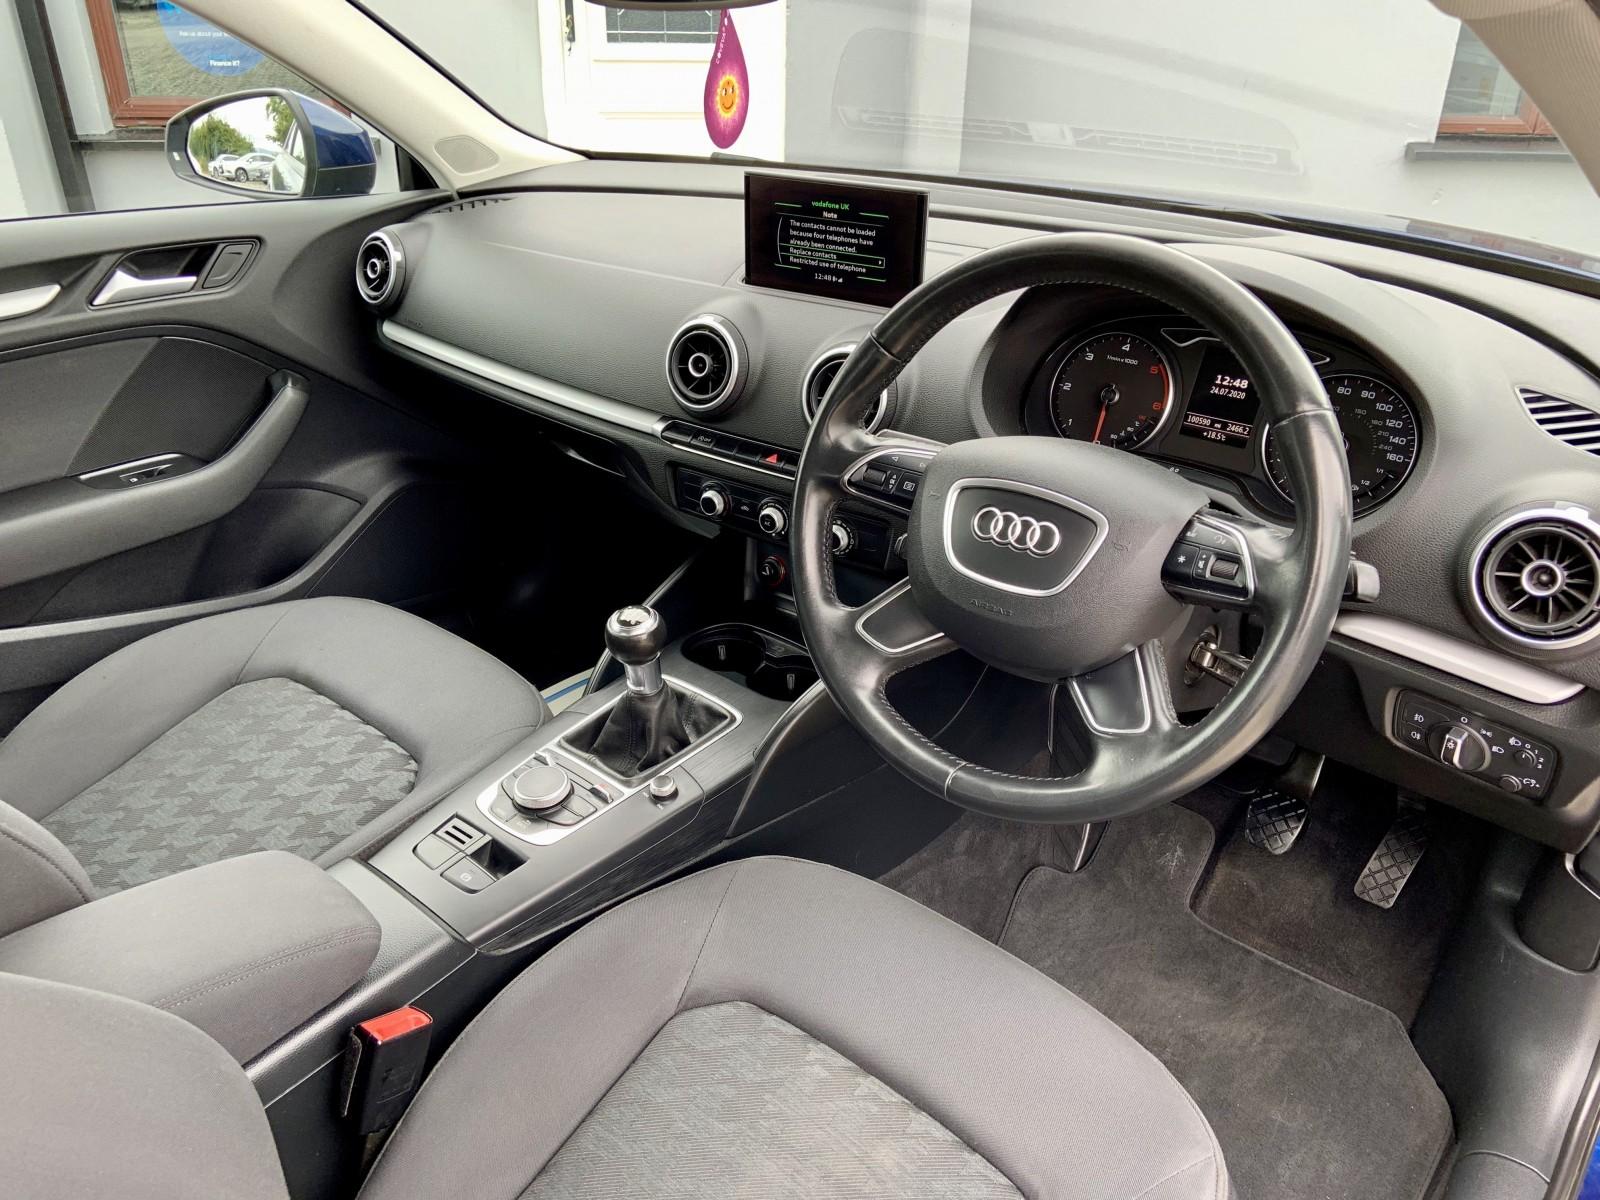 2015 Audi A3 TDI SE TECHNIK Diesel Manual – BC Autosales 17A Airfield Road, Eglinton, Londonderry BT47 3PZ, UK full